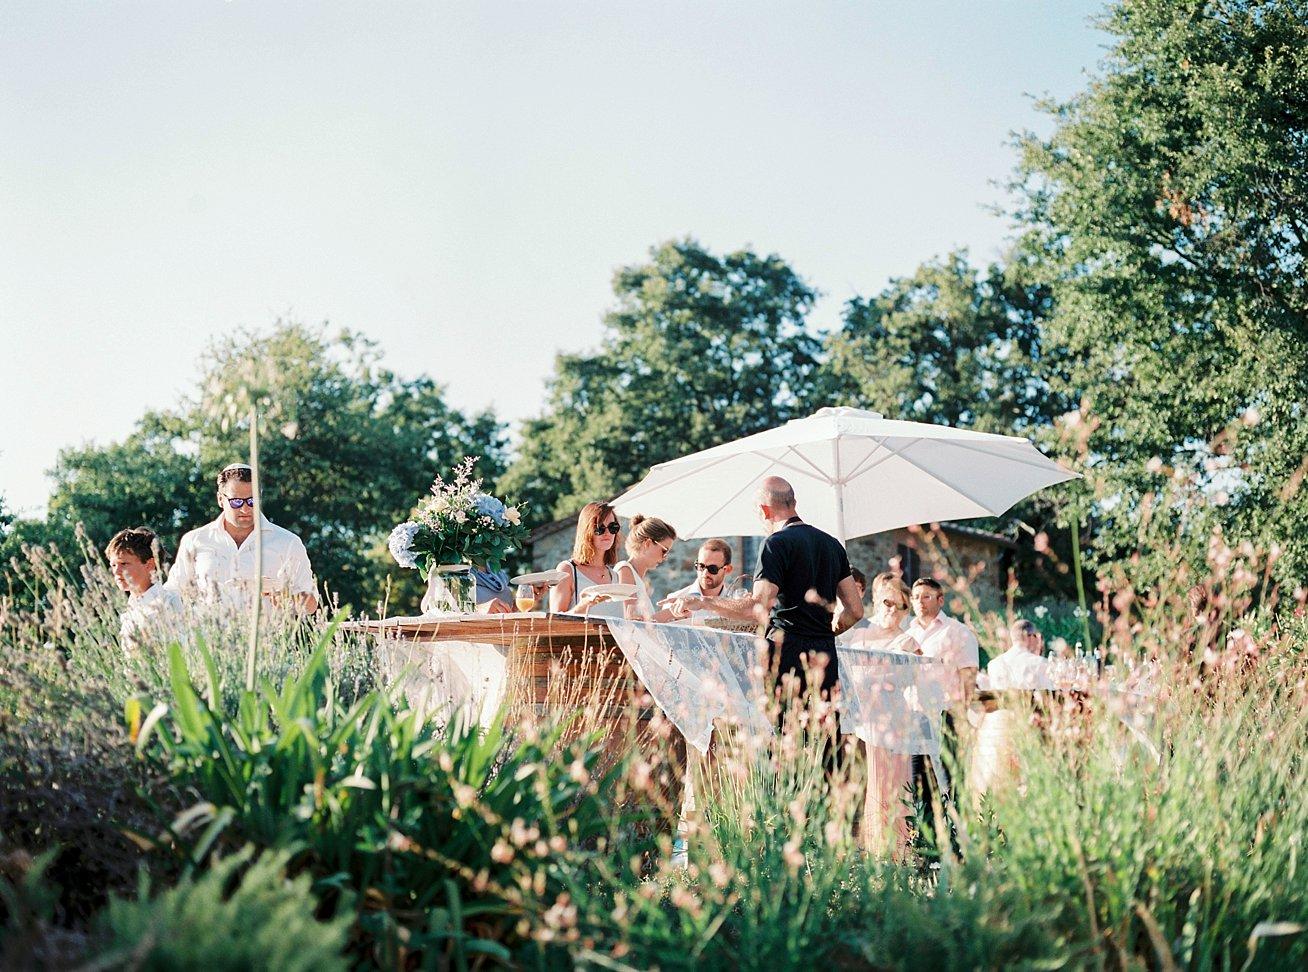 Amanda-Drost-Fotografie-Bruioft-Italie-Trouwen-buitenland-destination-wedding-italy_0057.jpg